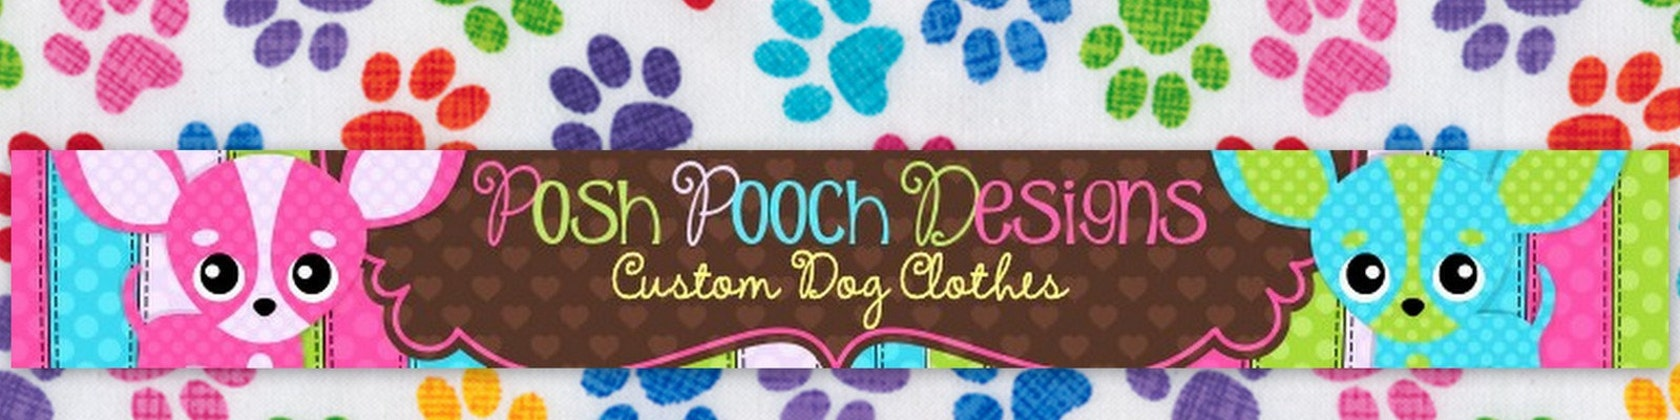 a7f3d70fa8e Posh Pooch Designs Etsy Shop by poshpoochdesigns on Etsy